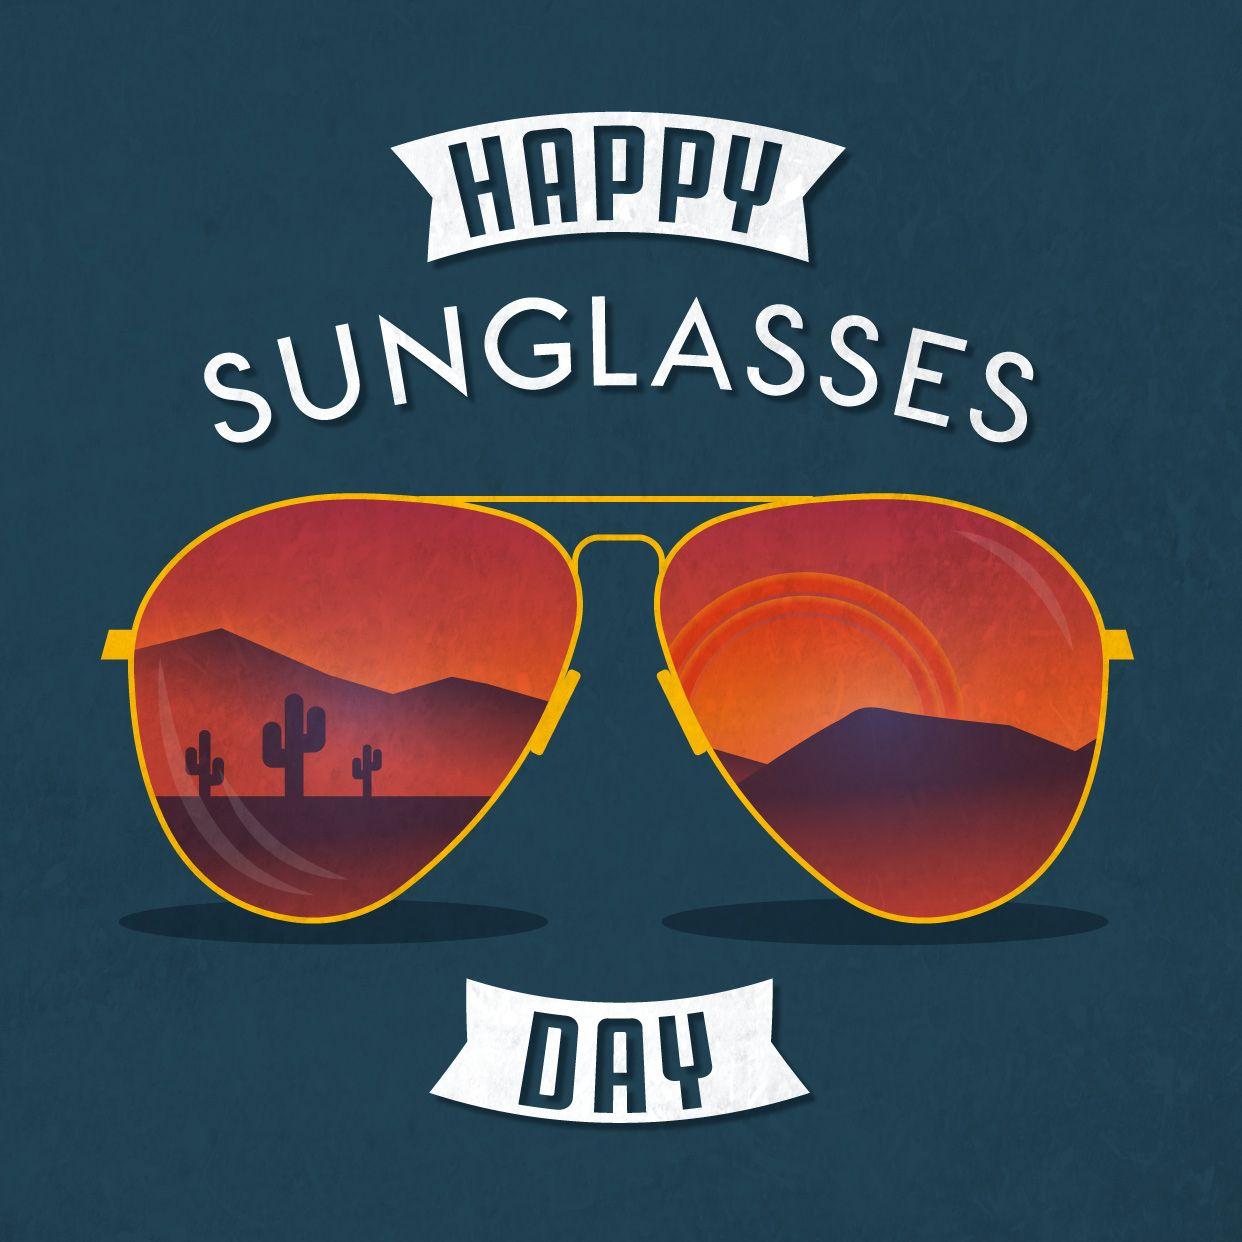 b2acbdc122 HAPPY SUNGLASSES DAY! June 27 is National Sunglasses Day